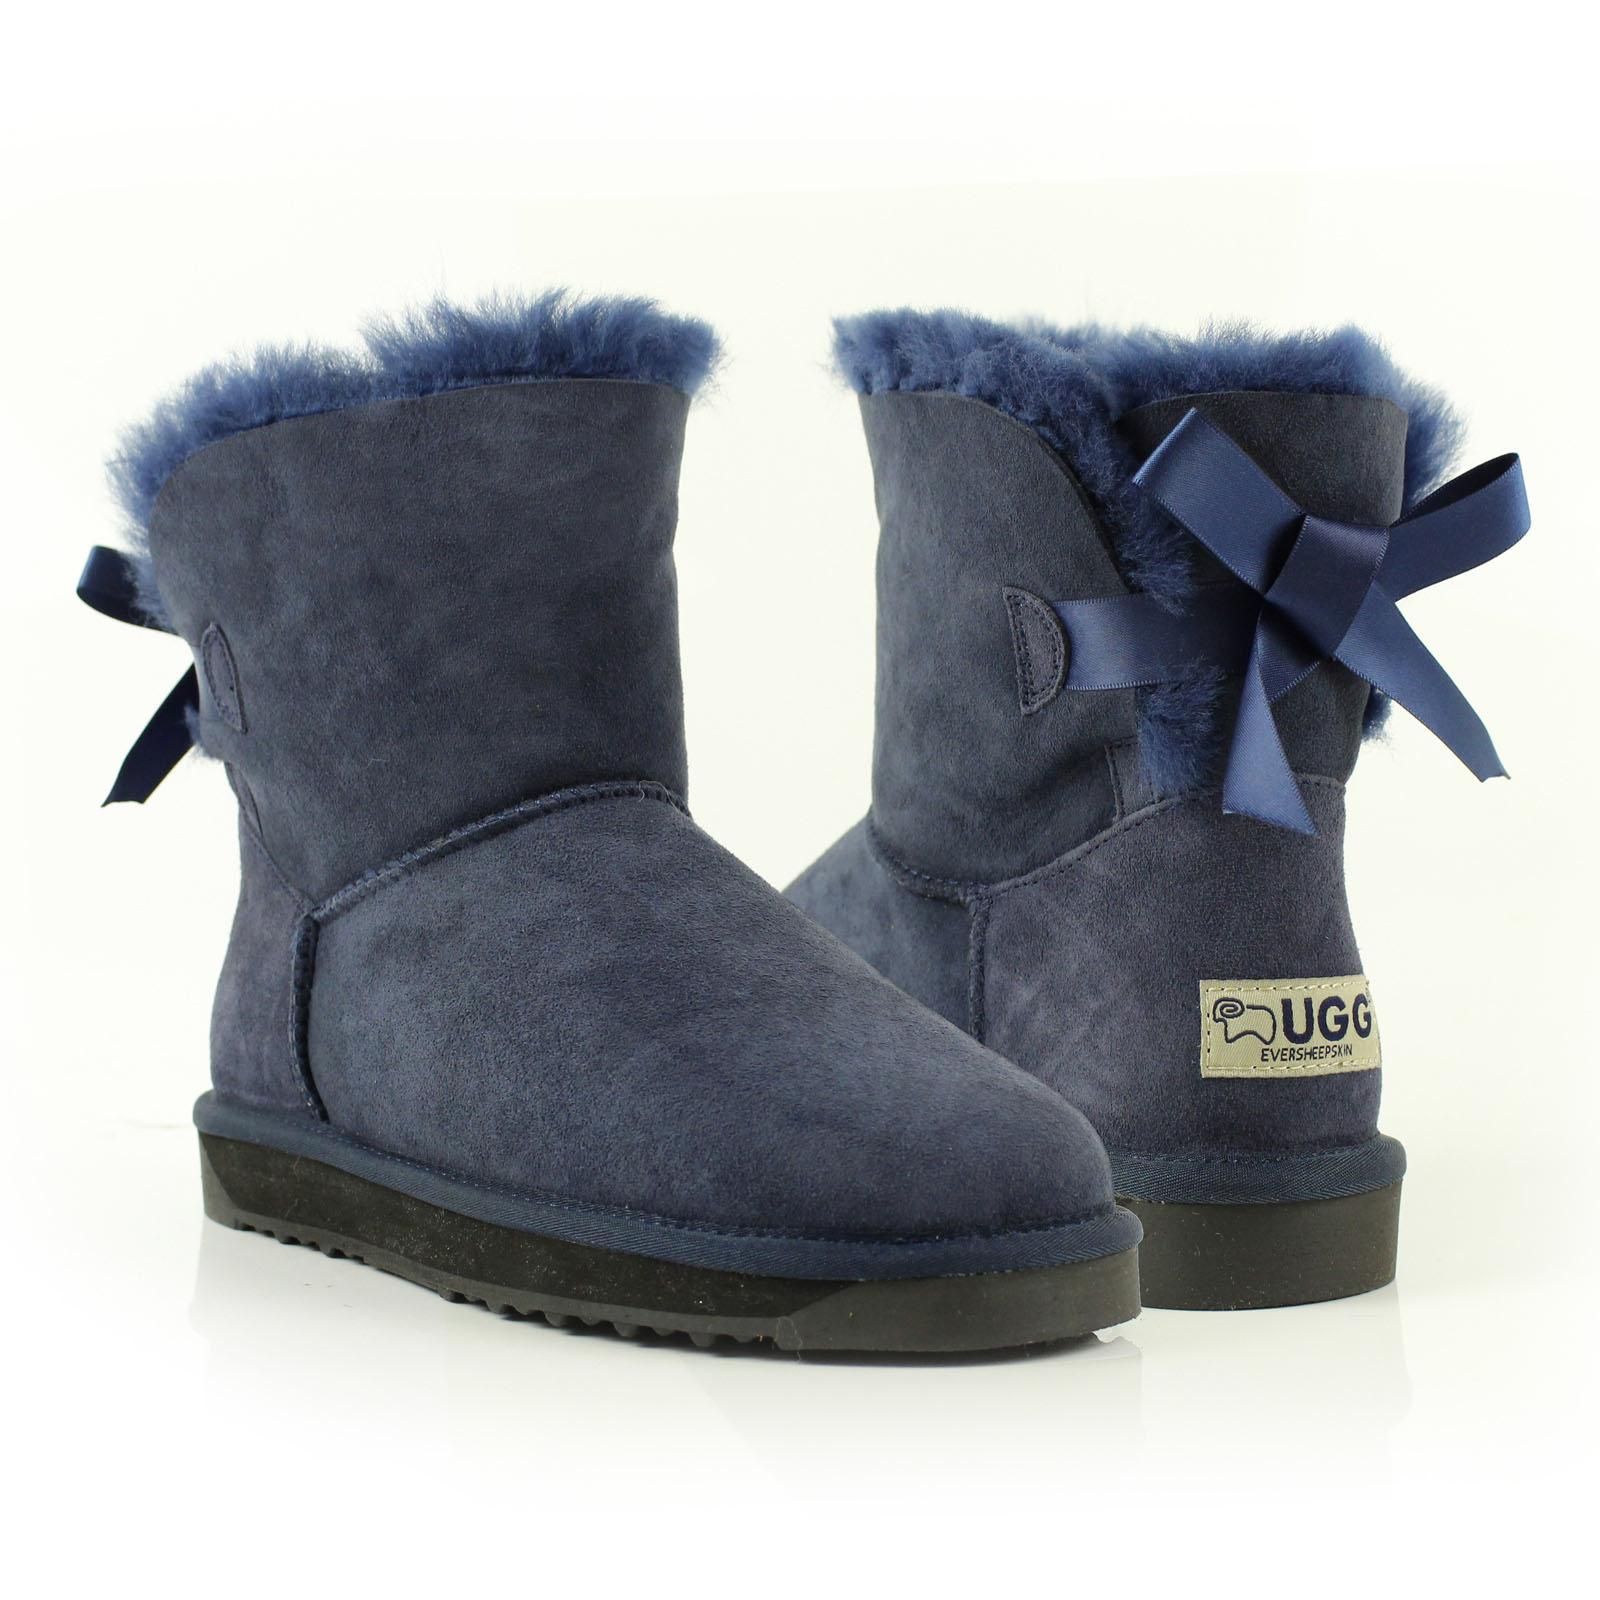 UGG-BOOTS-NEW-100-Australian-Sheepskin-Kids-Mini-